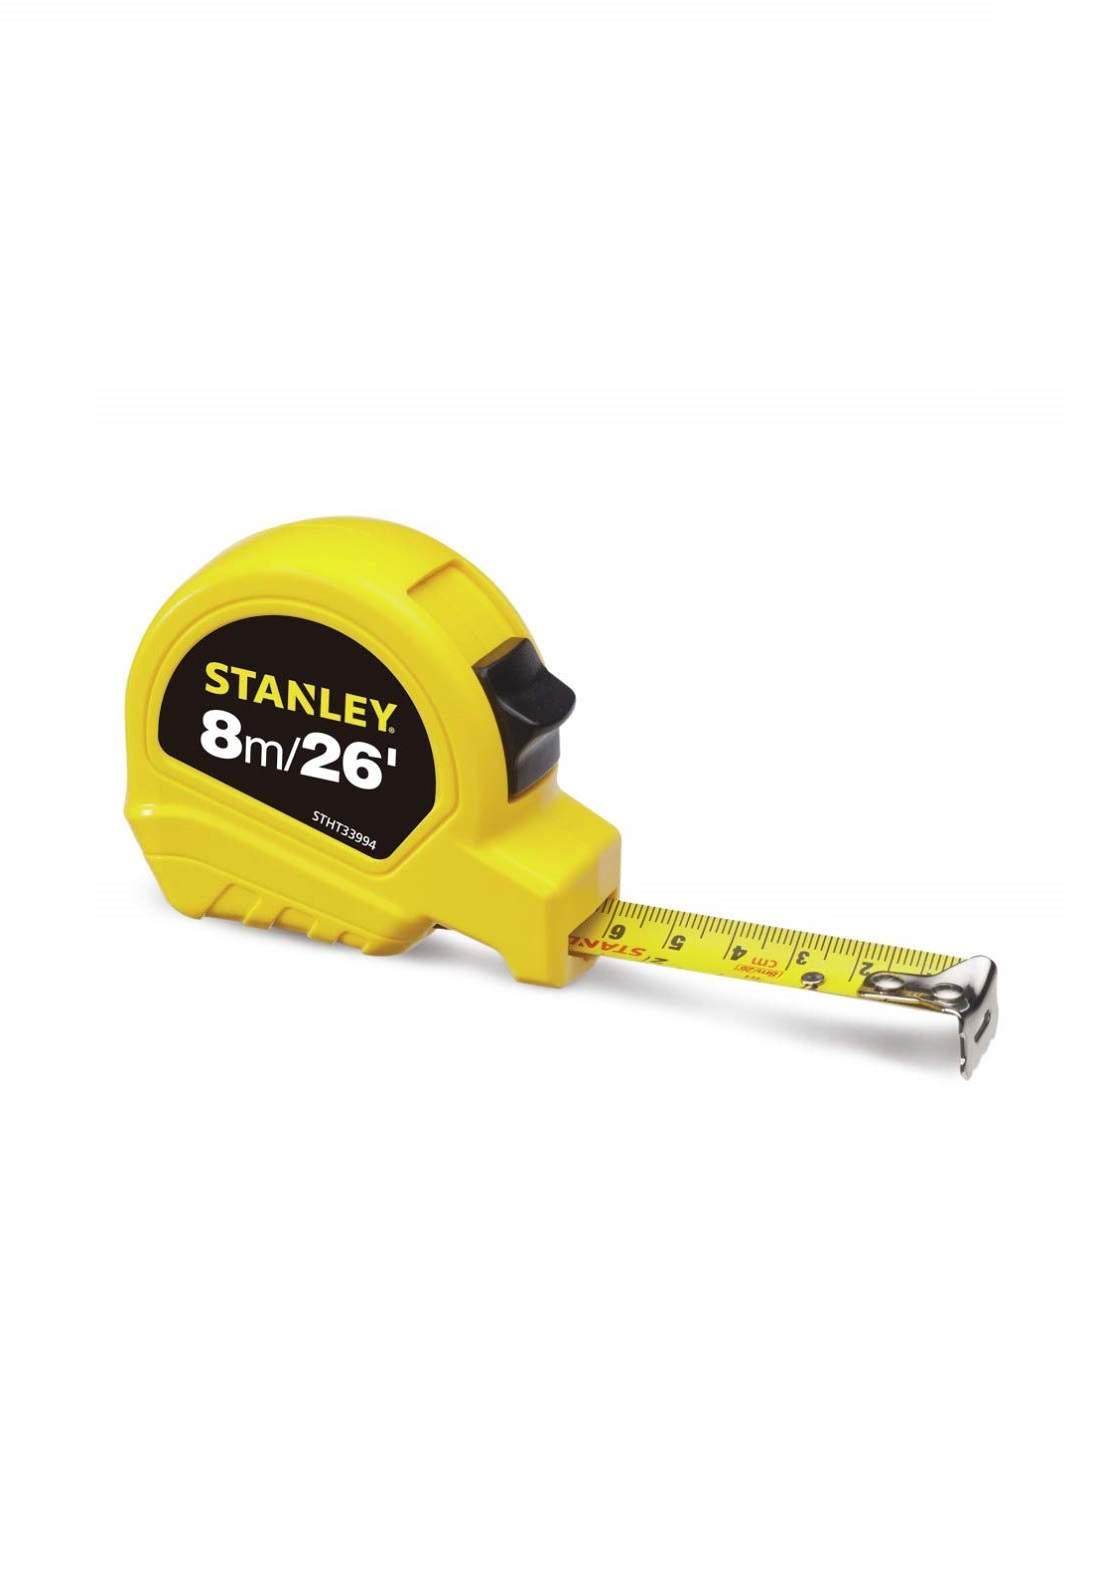 Stanley STHT33994-8  Measuring Tape 8M/E x 25mm فيتة  8 م